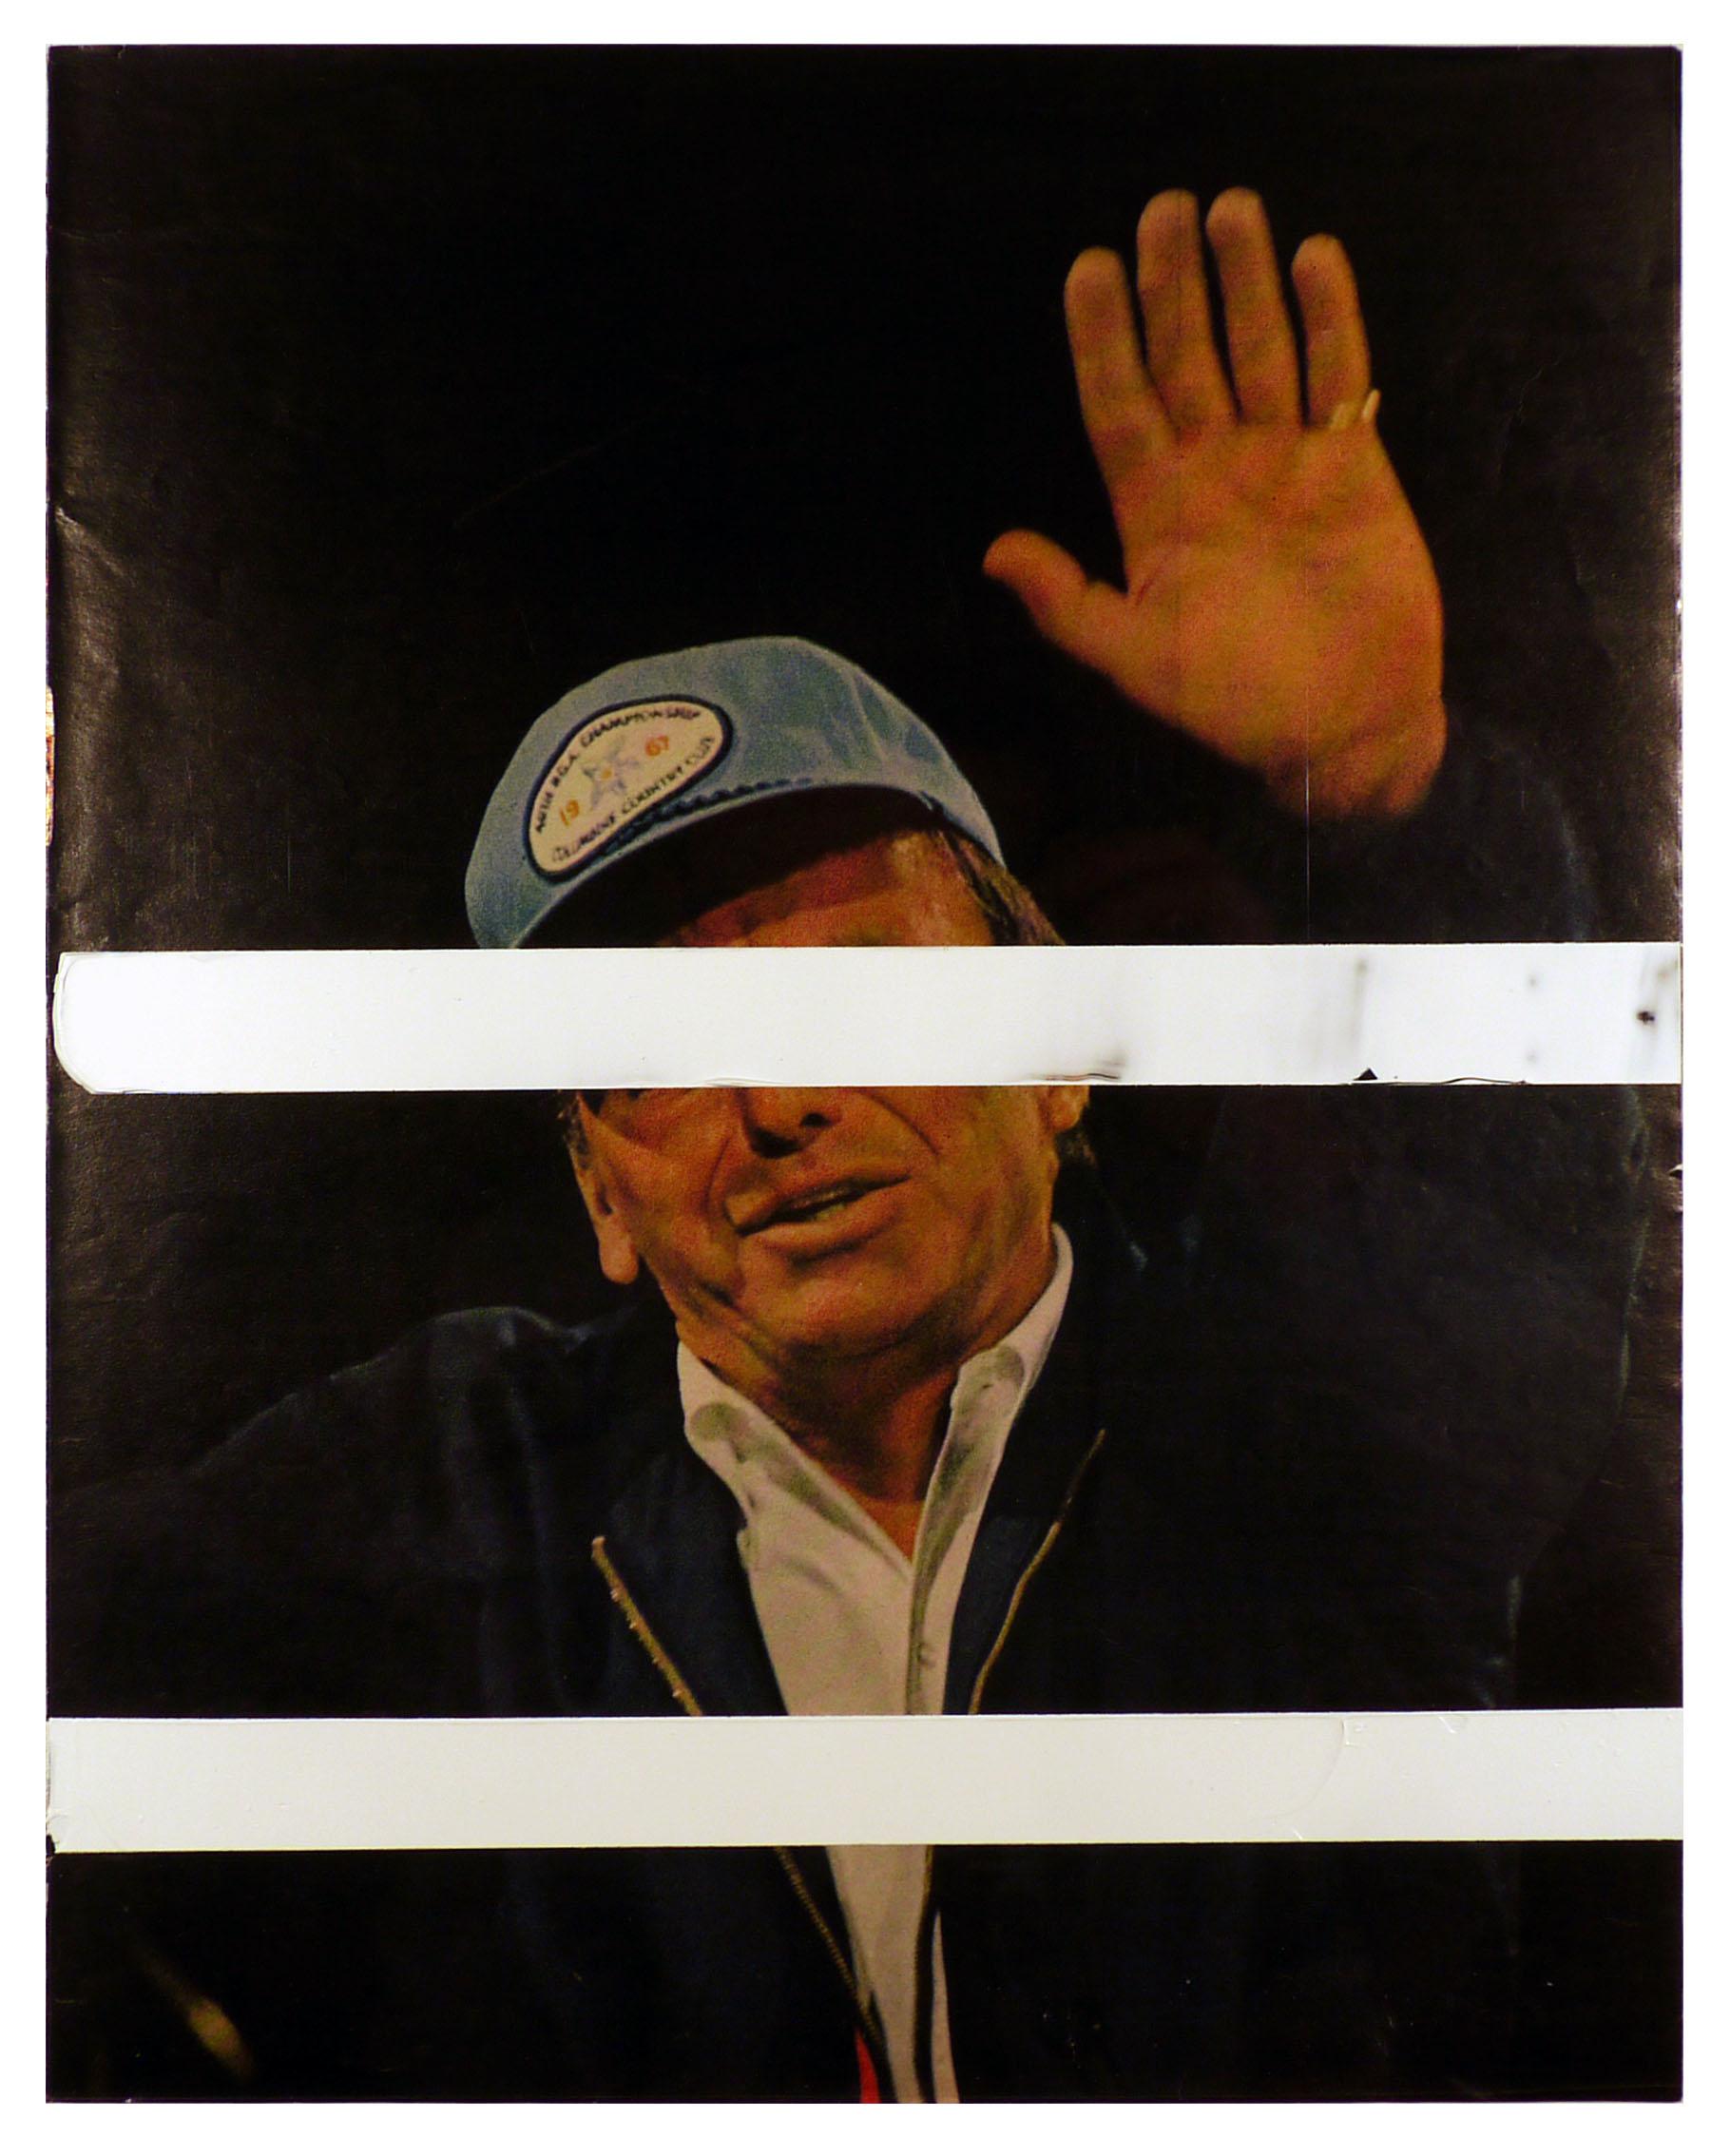 frank  10.25 x 13 inches  acrylic duralar paper